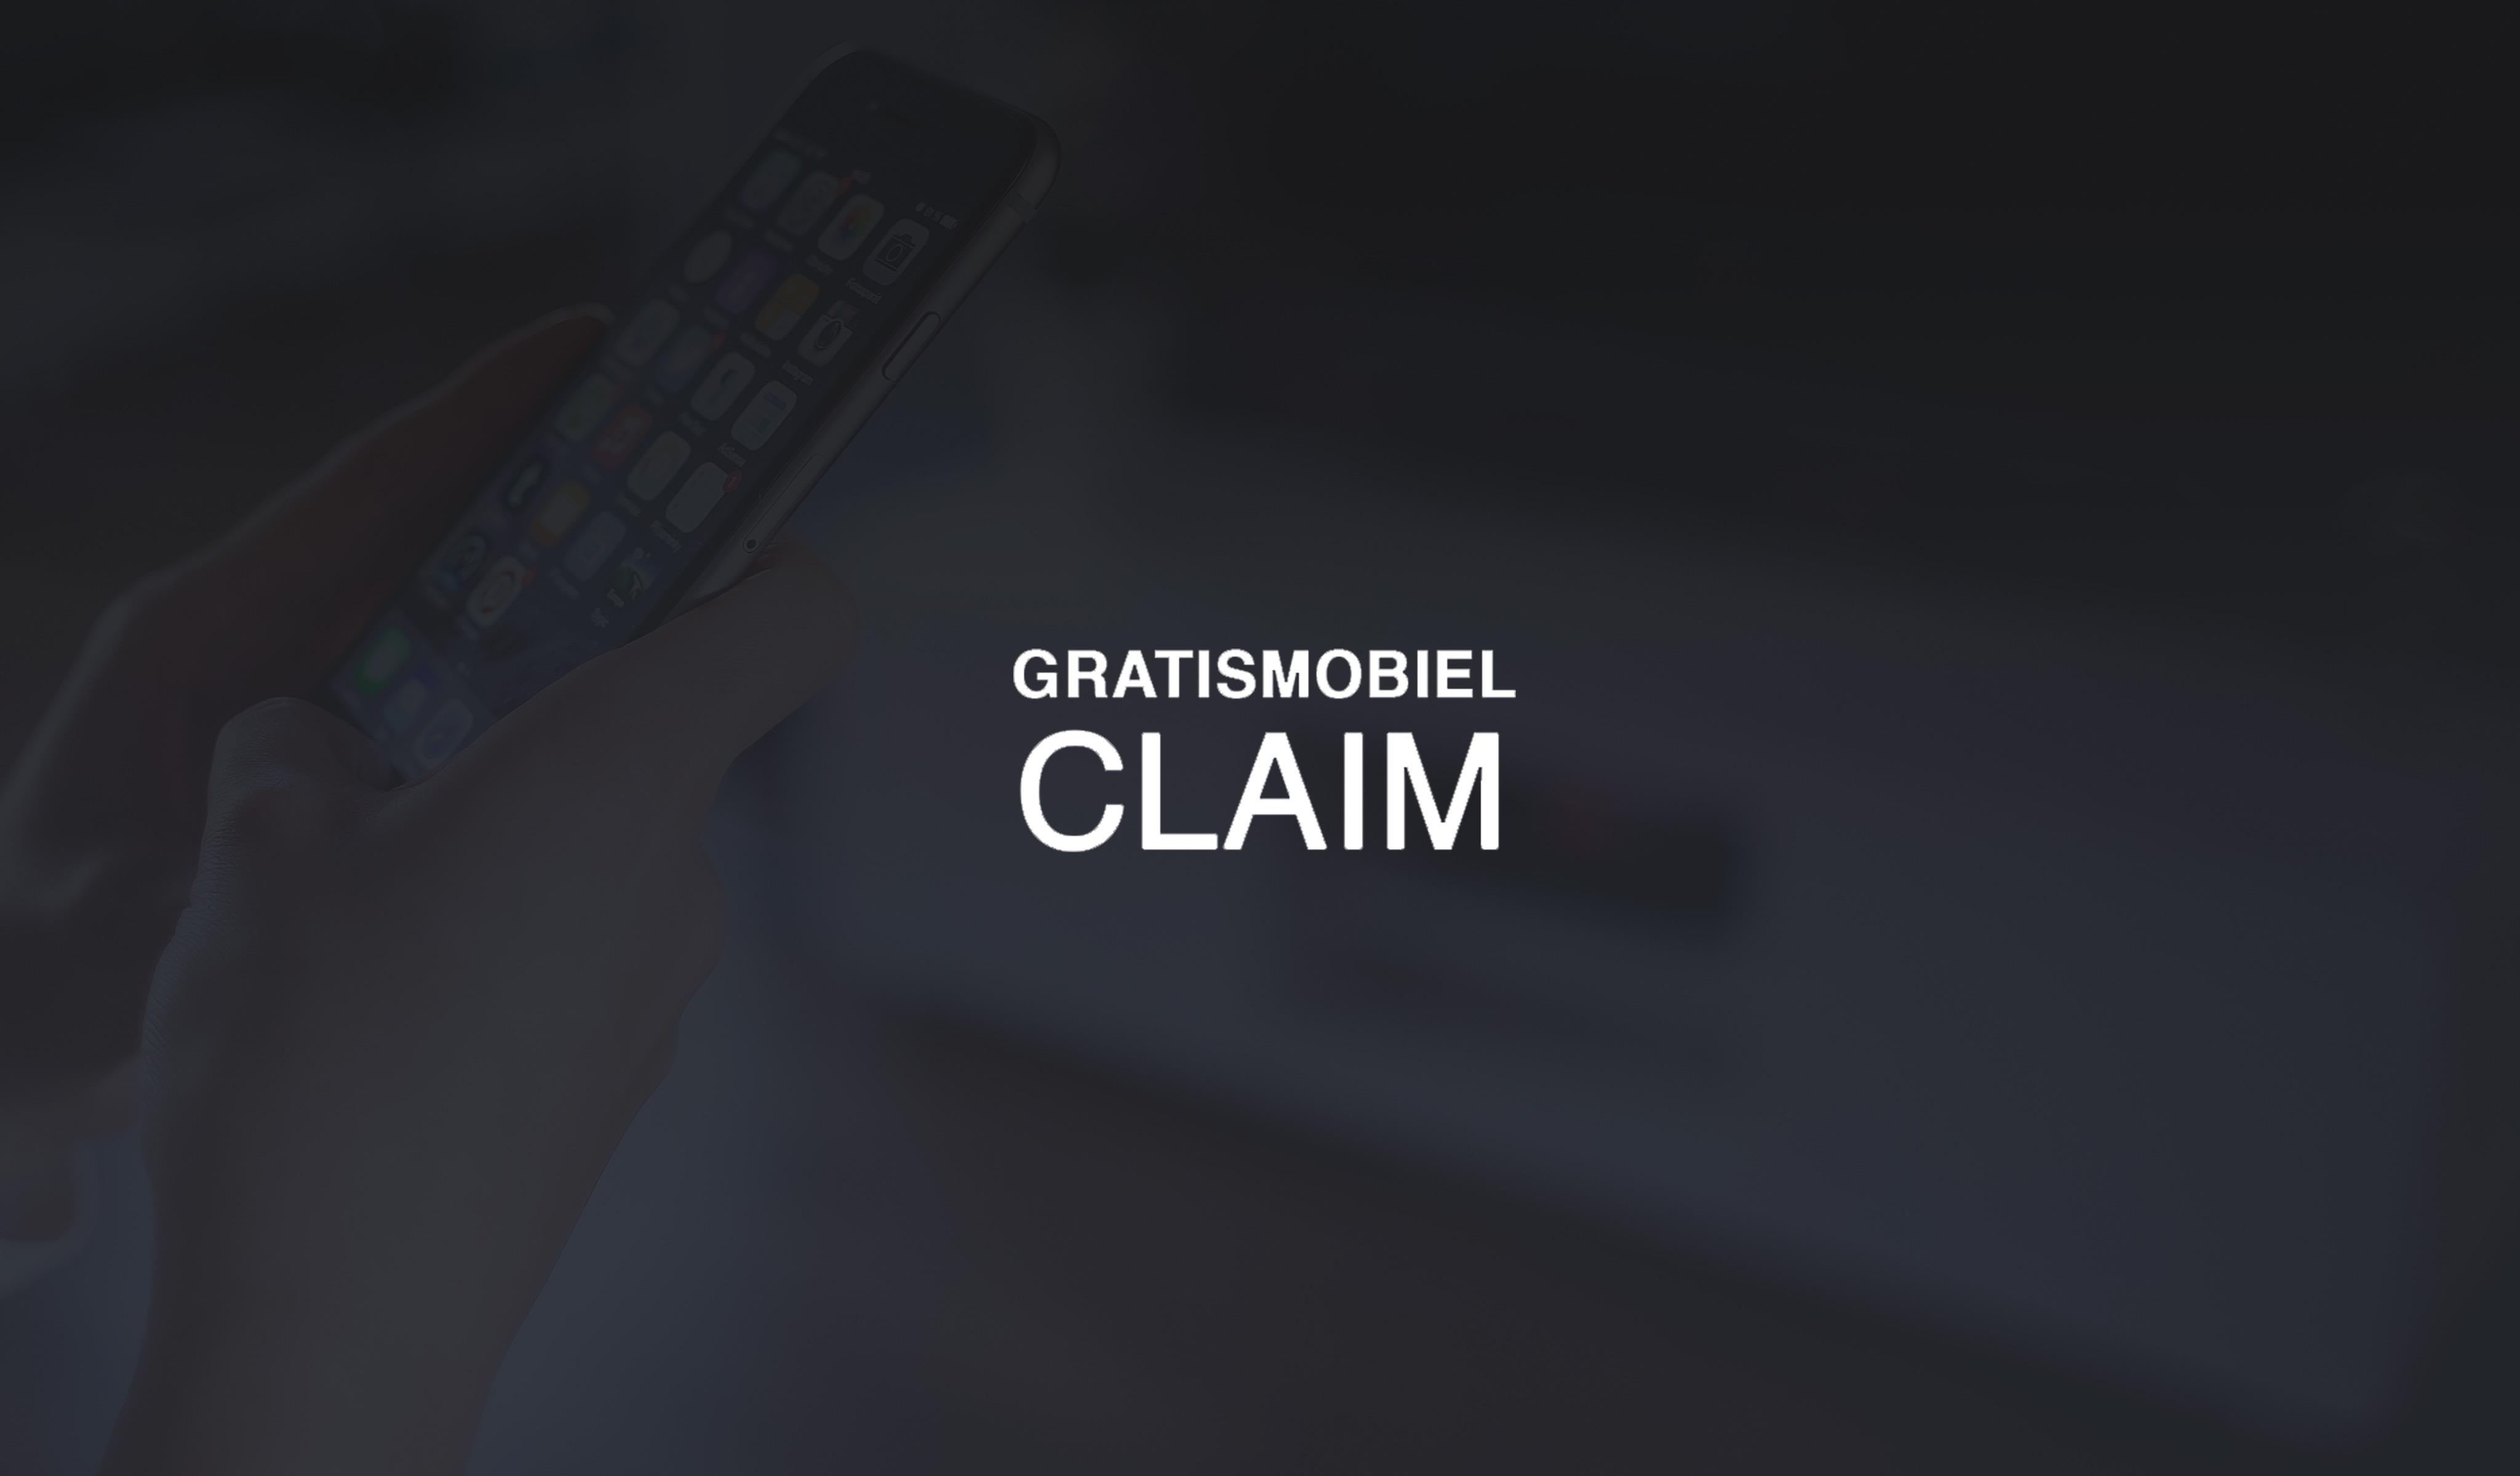 Gratis Claim Mobiel Claim - Compensatie - Corpocon